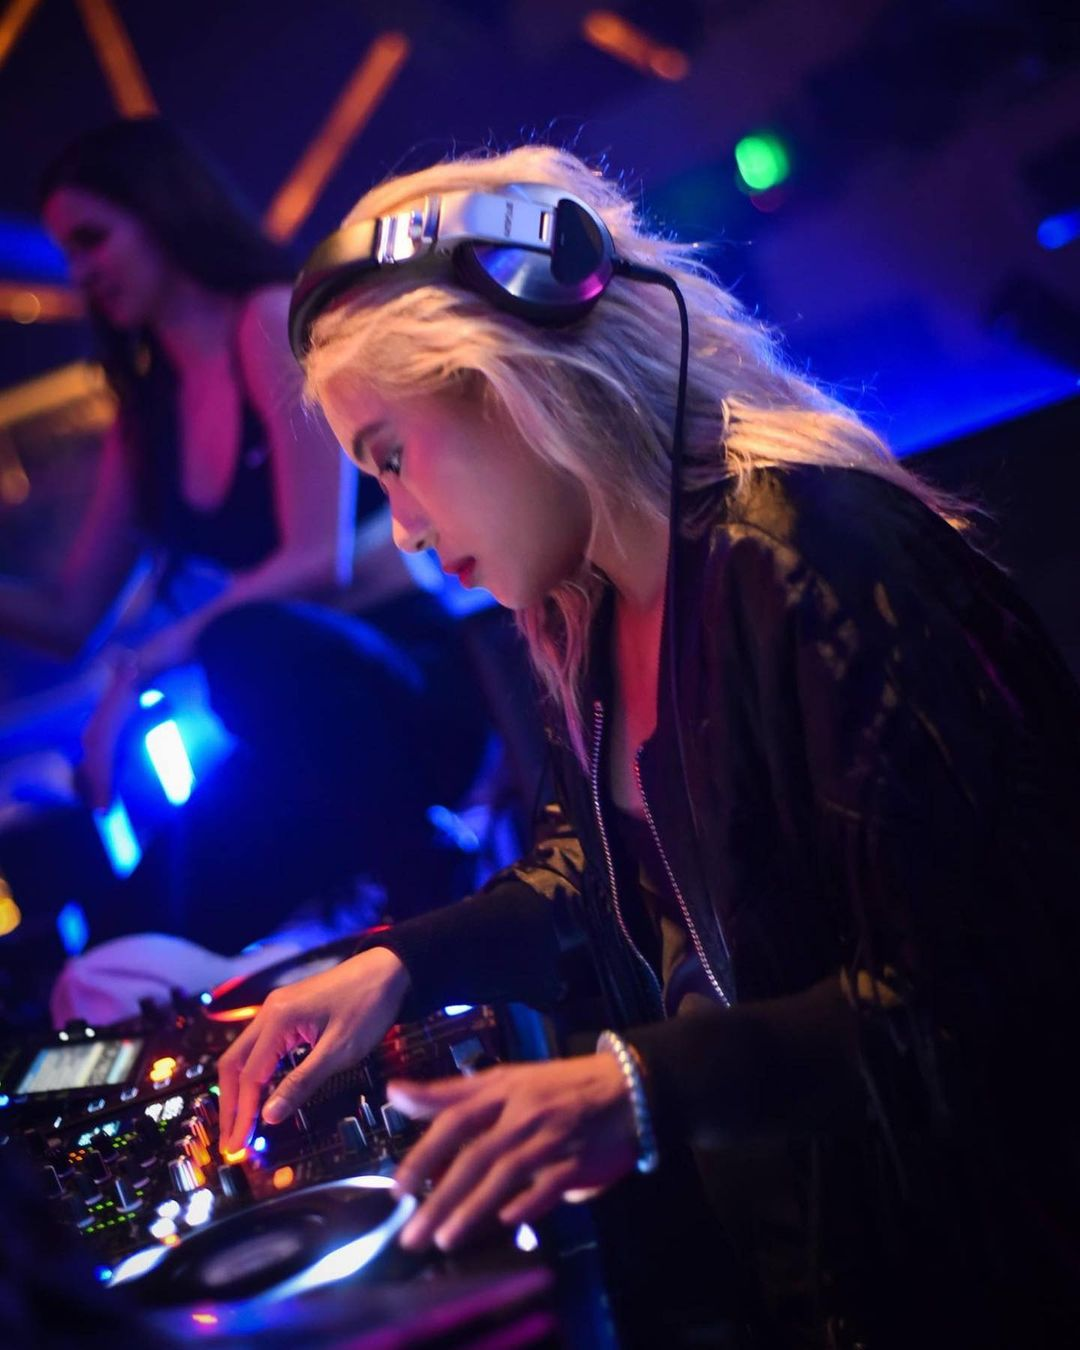 DJ Katsy Lee, Female DJ yang Mengenal Musik Sejak Usia 8 Tahun